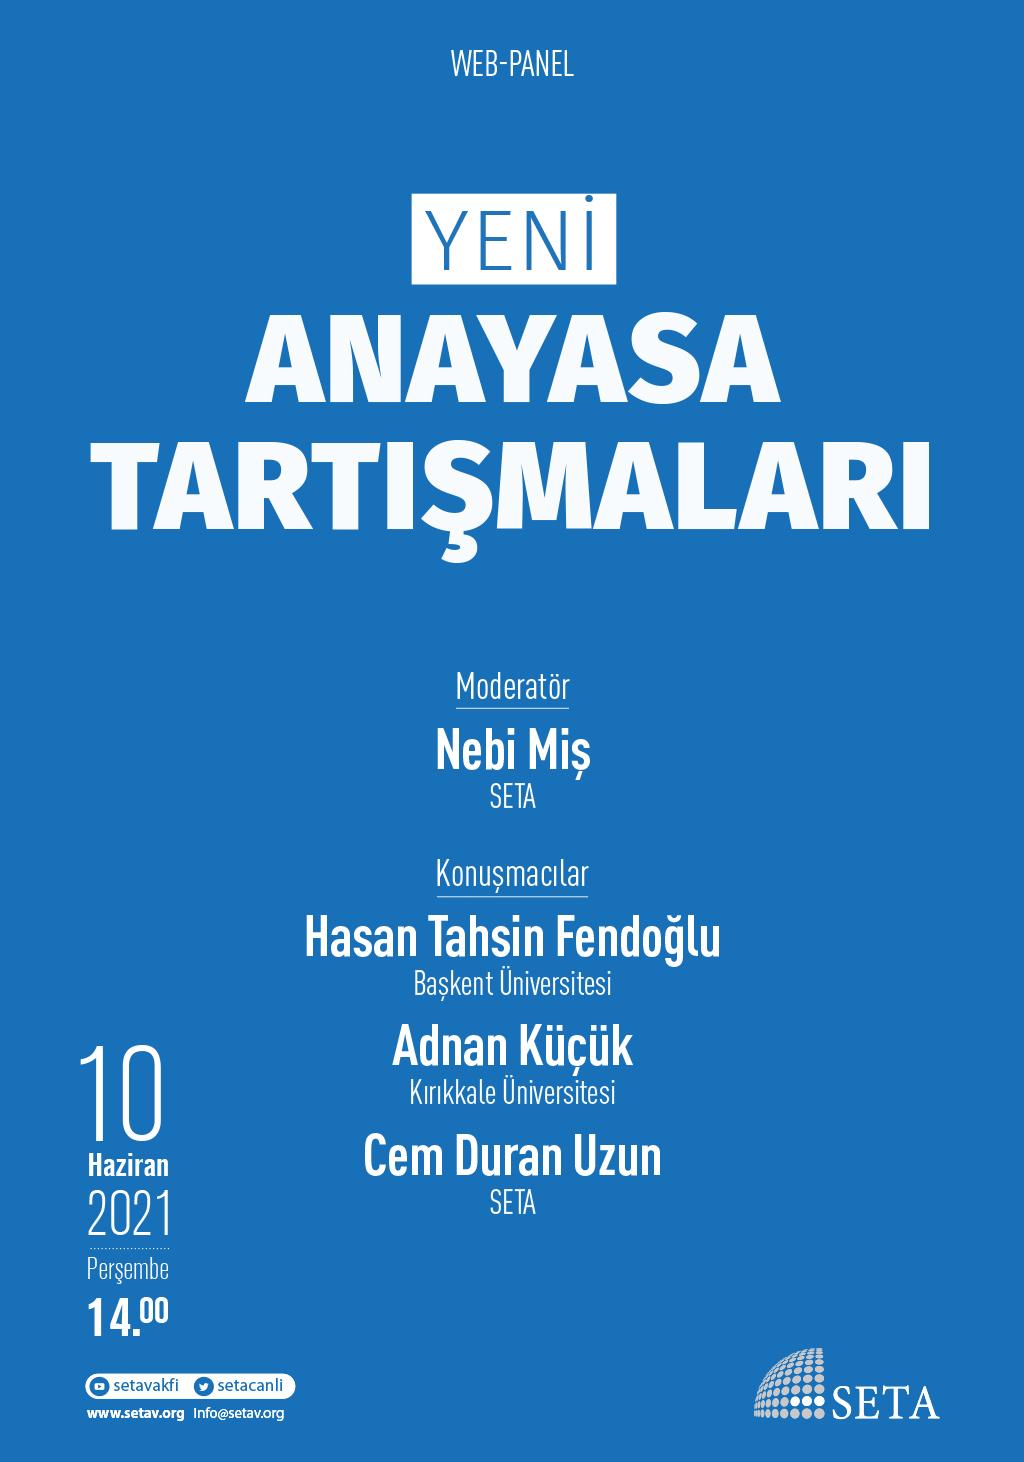 Web Panel: Yeni Anayasa Tartışmaları